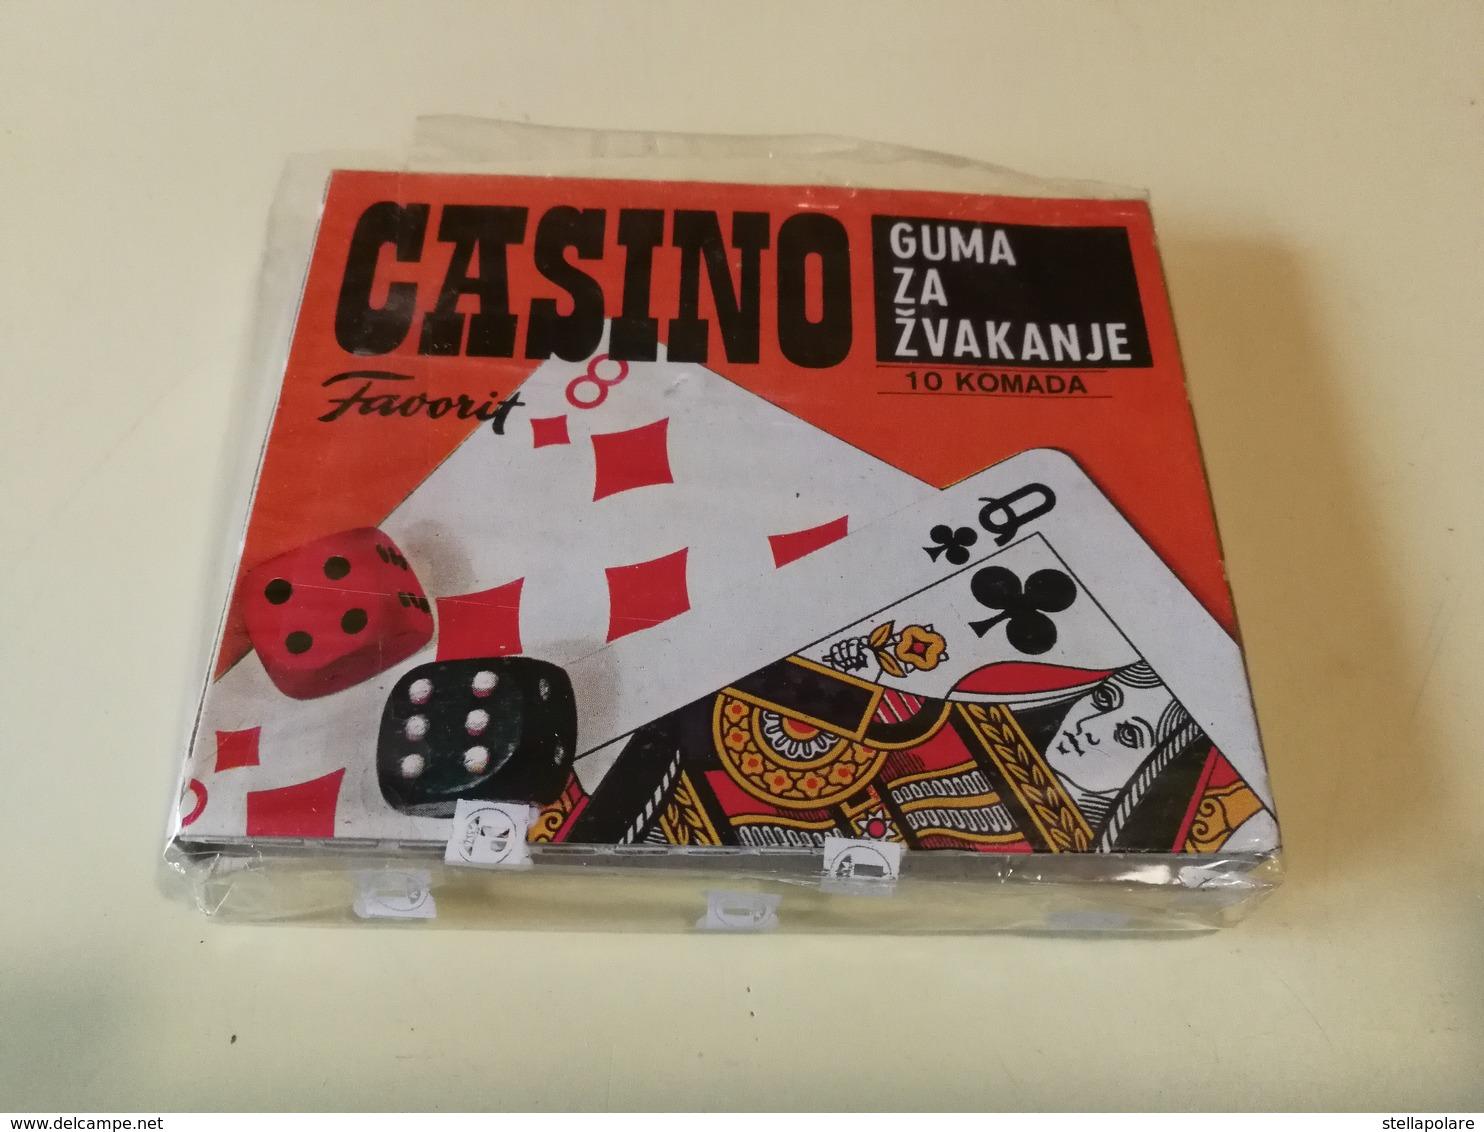 CASINO FAVORIT BUBBLE GUM VINTAGE PACKET YUGOSLAVIA ZVAKE - Other